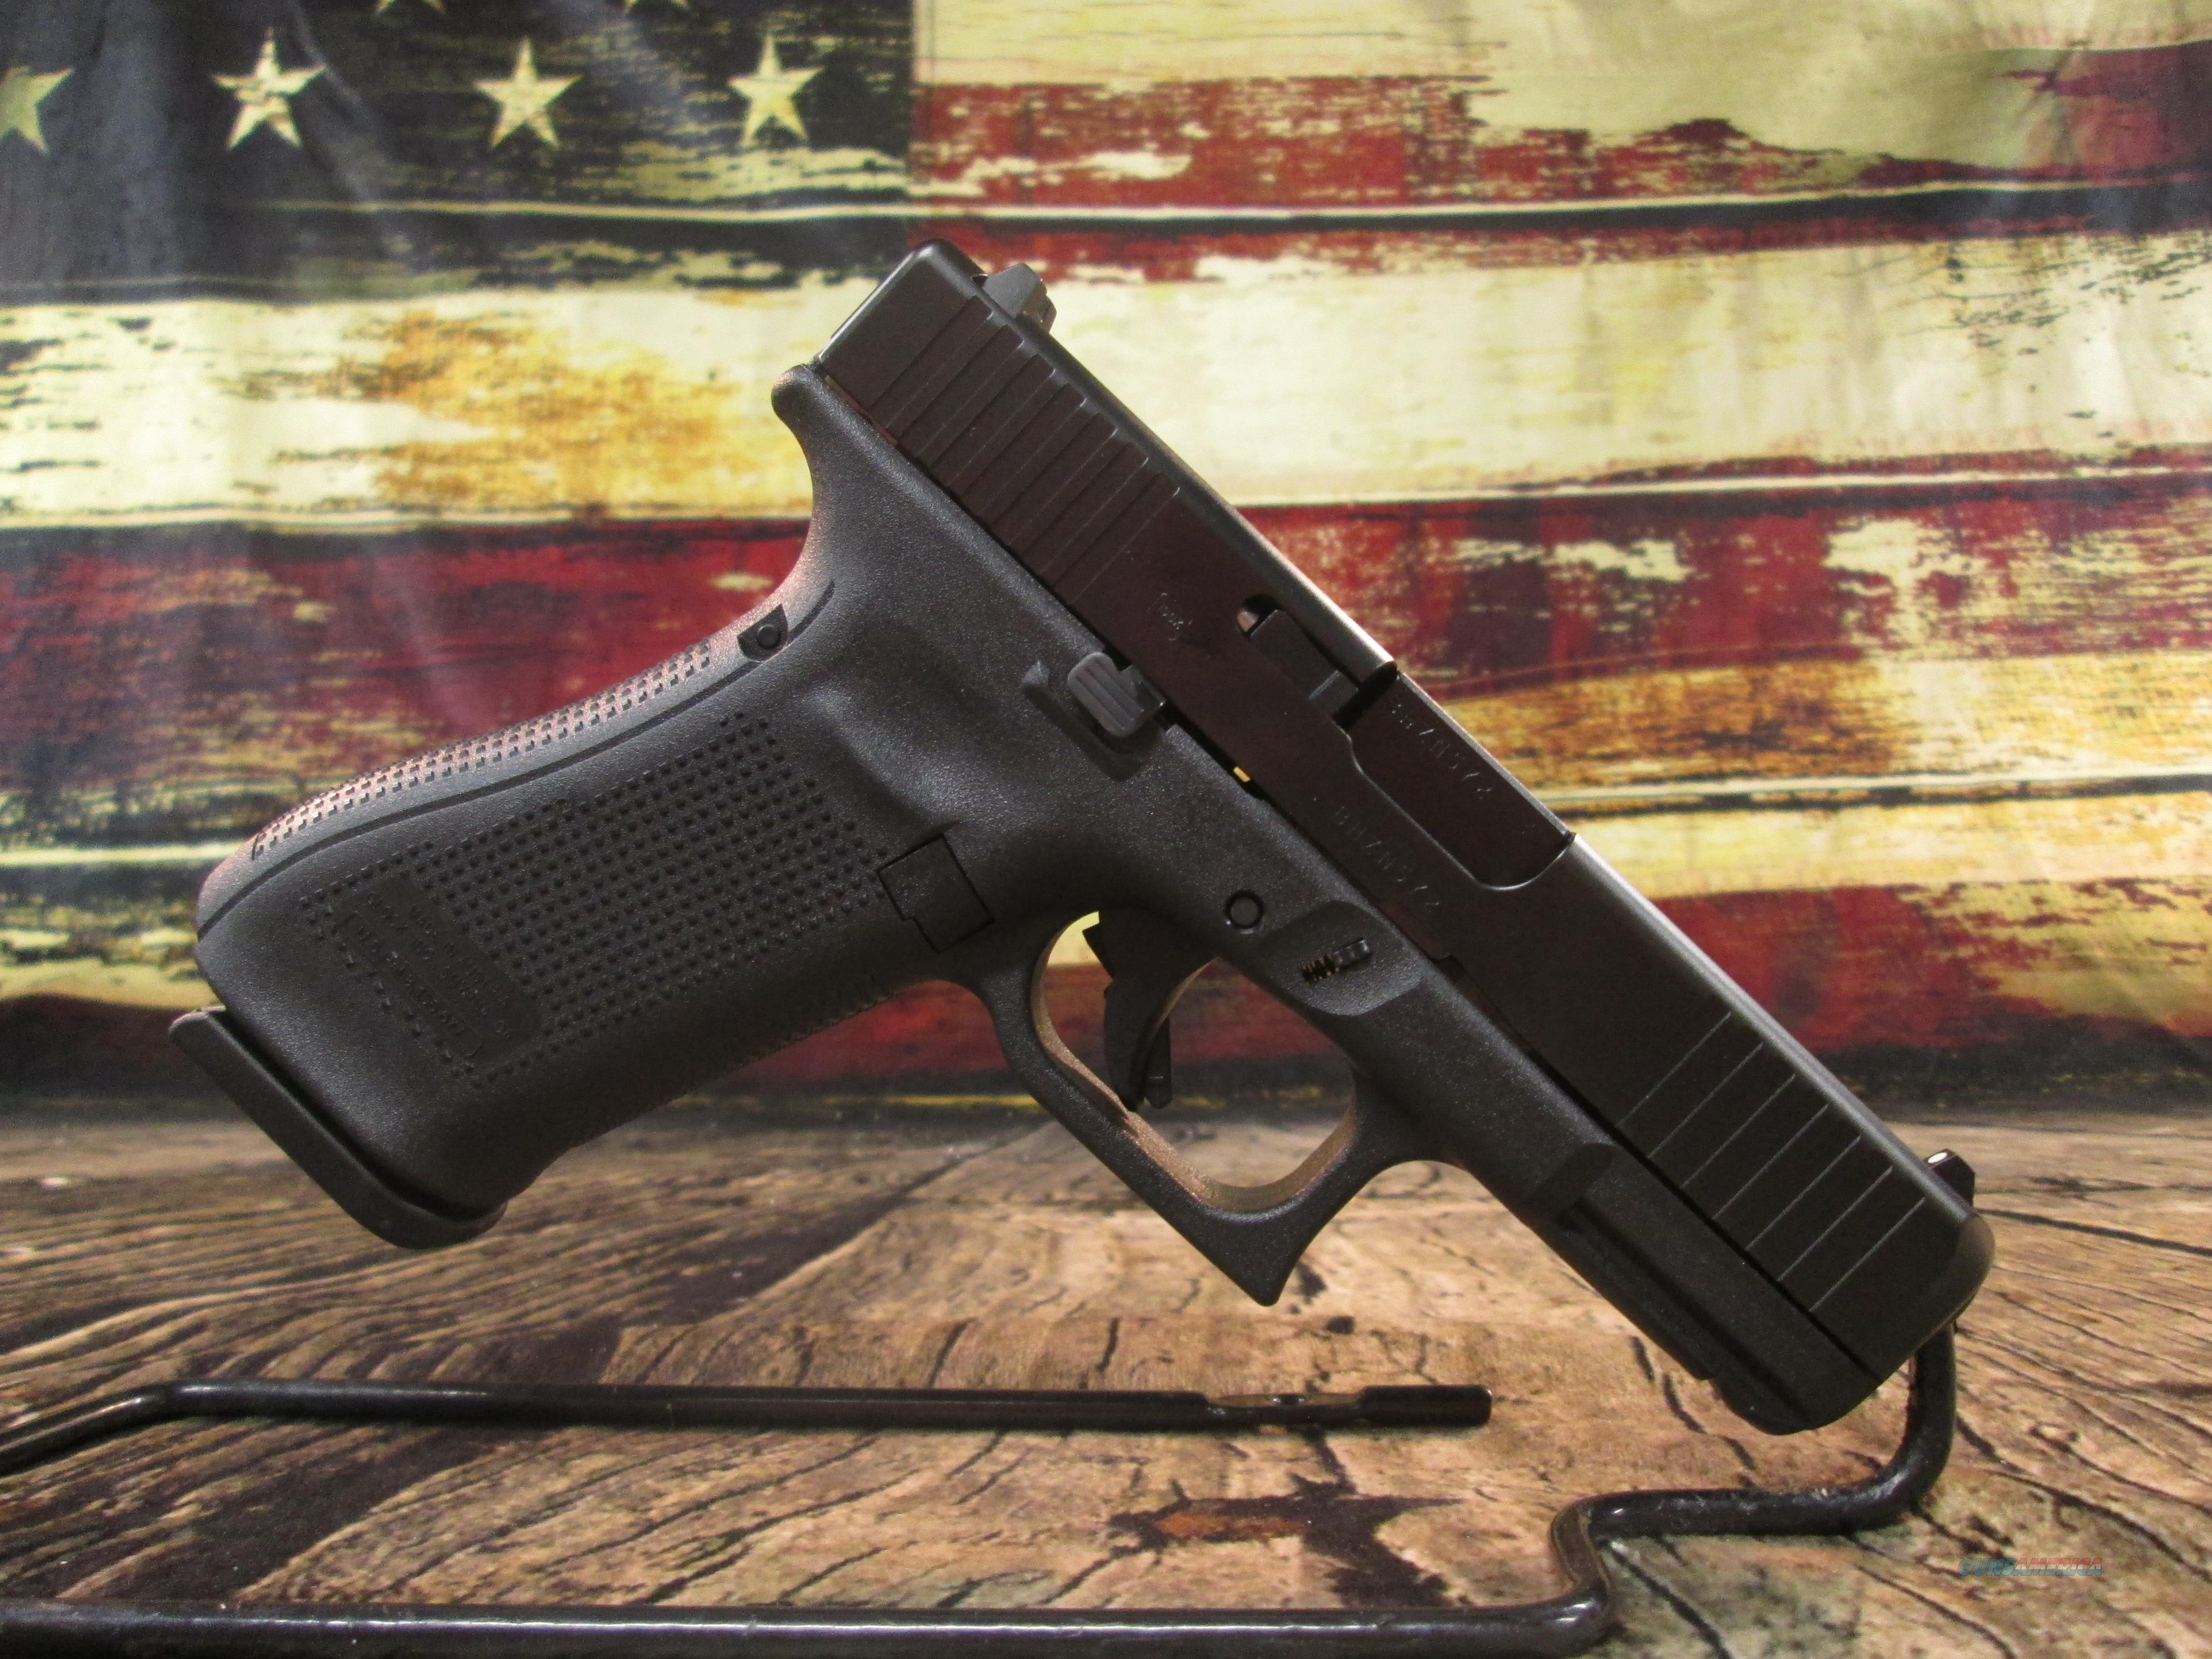 Glock Model 45 Gen 5 .9mm New (PA455S203)   Guns > Pistols > Glock Pistols > 19/19X